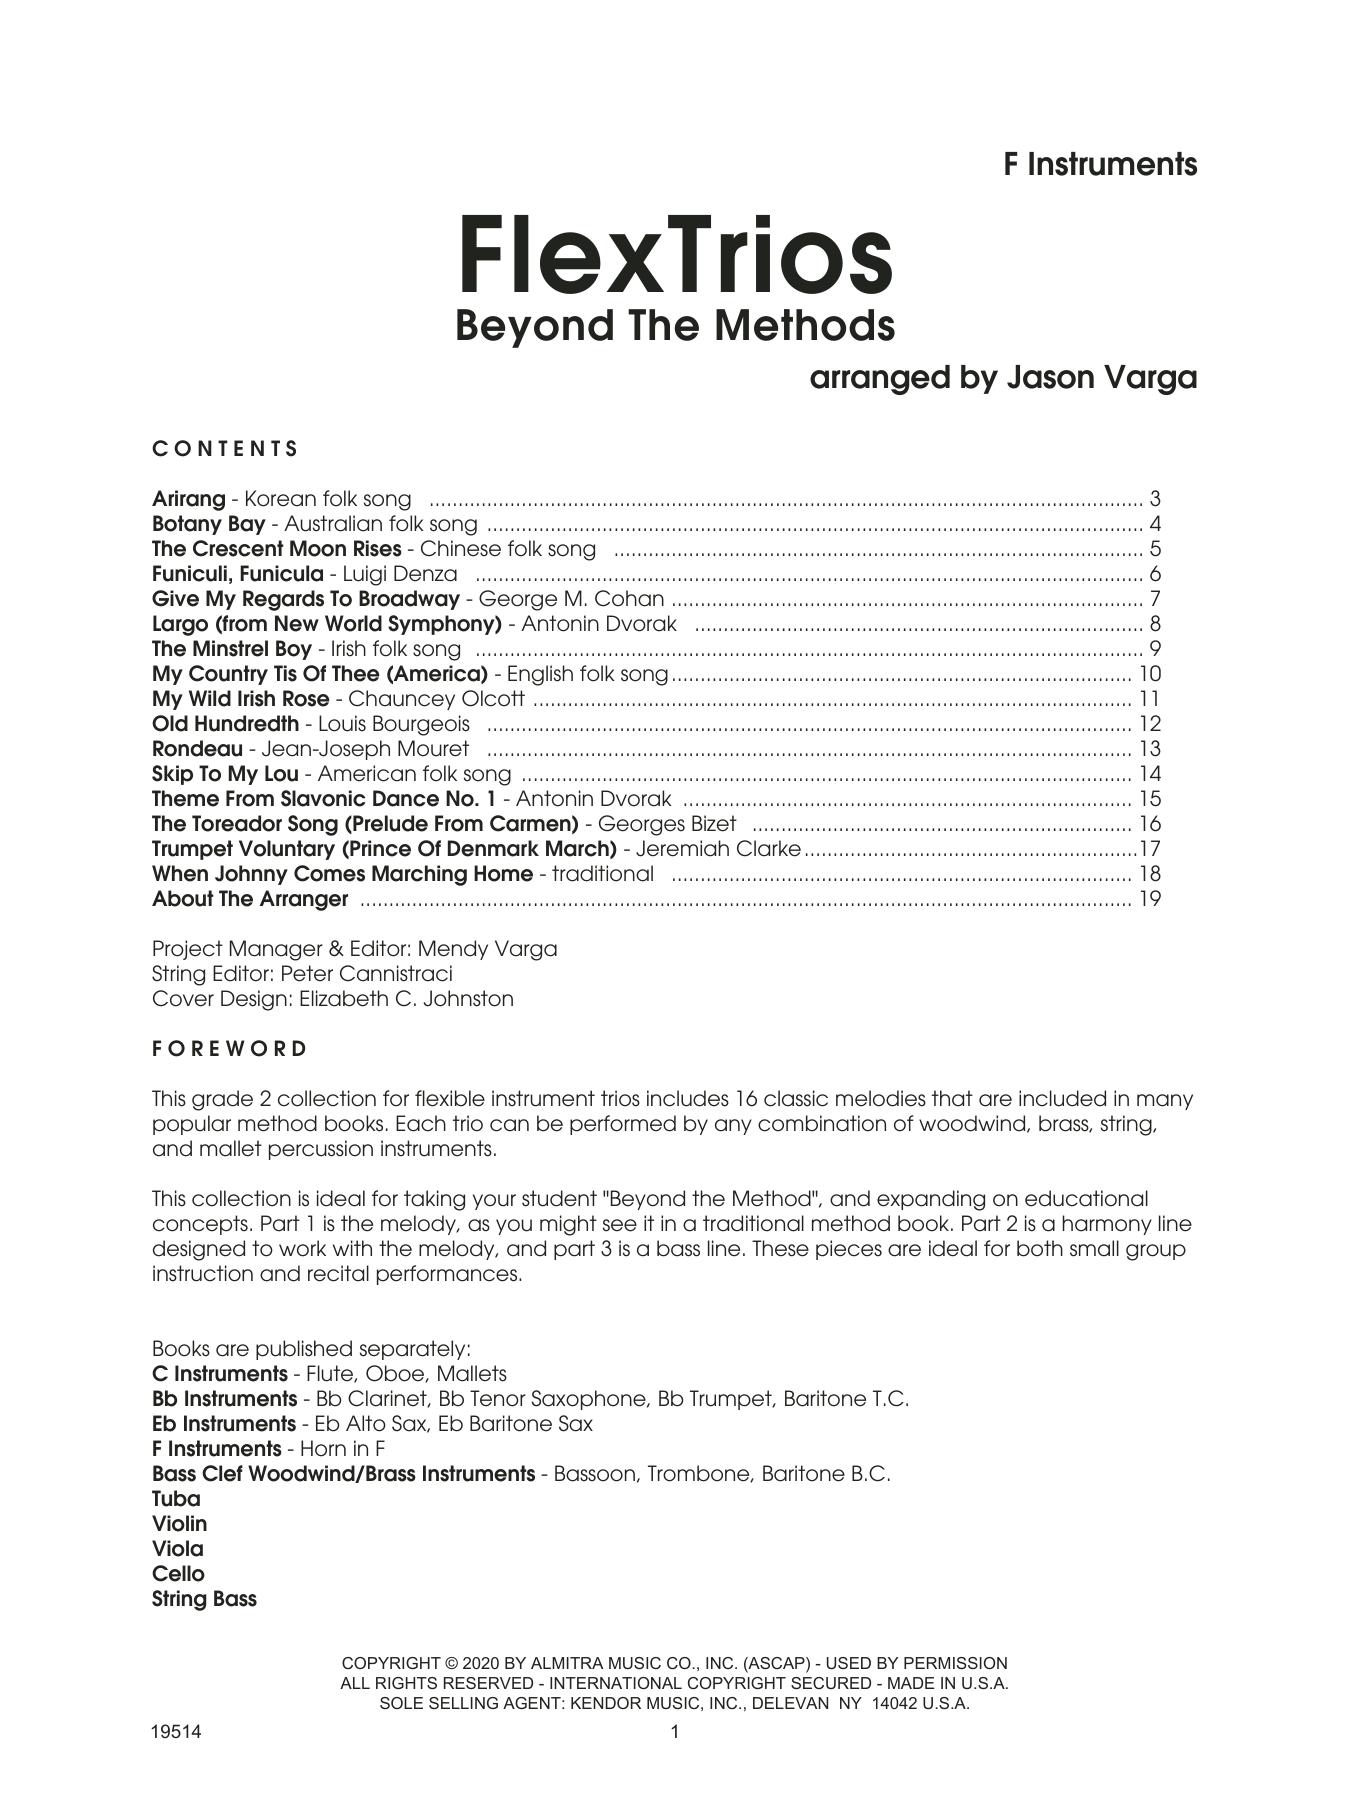 Jason Varga Flextrios - Beyond The Methods (16 Pieces) - F Instruments sheet music notes printable PDF score